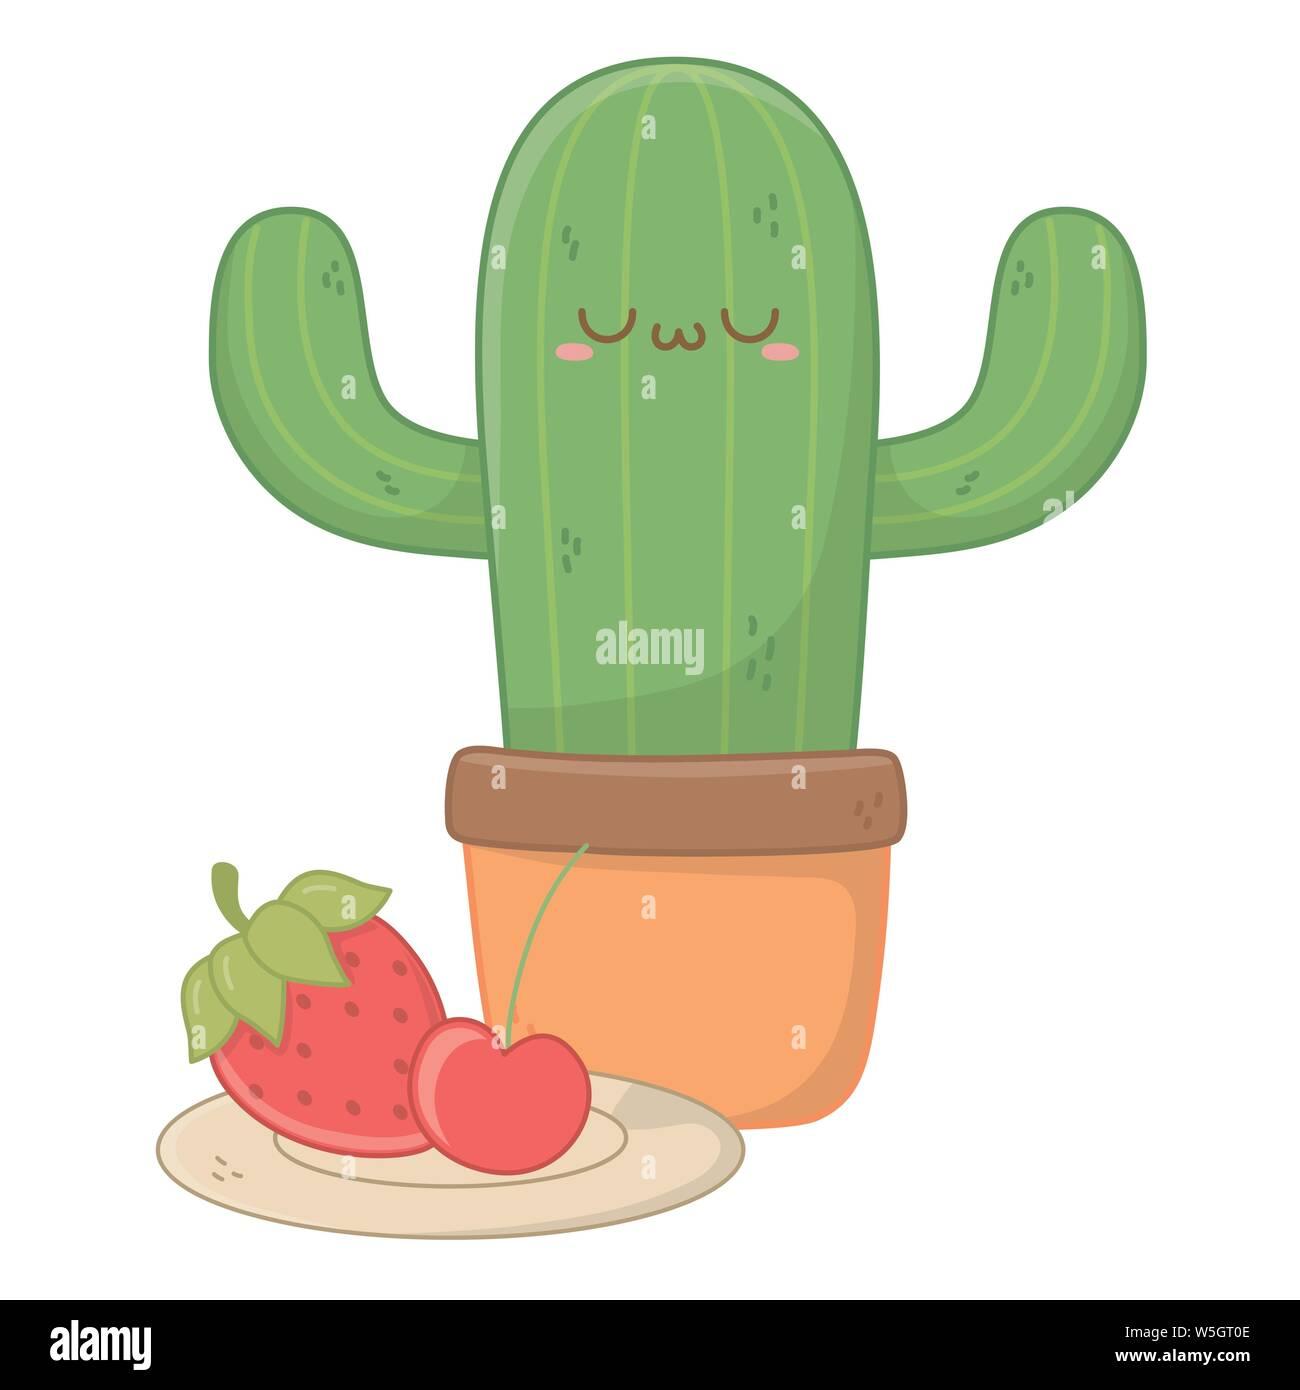 Design Dessin Animé Cactus Expression Kawaii Mignon Petit